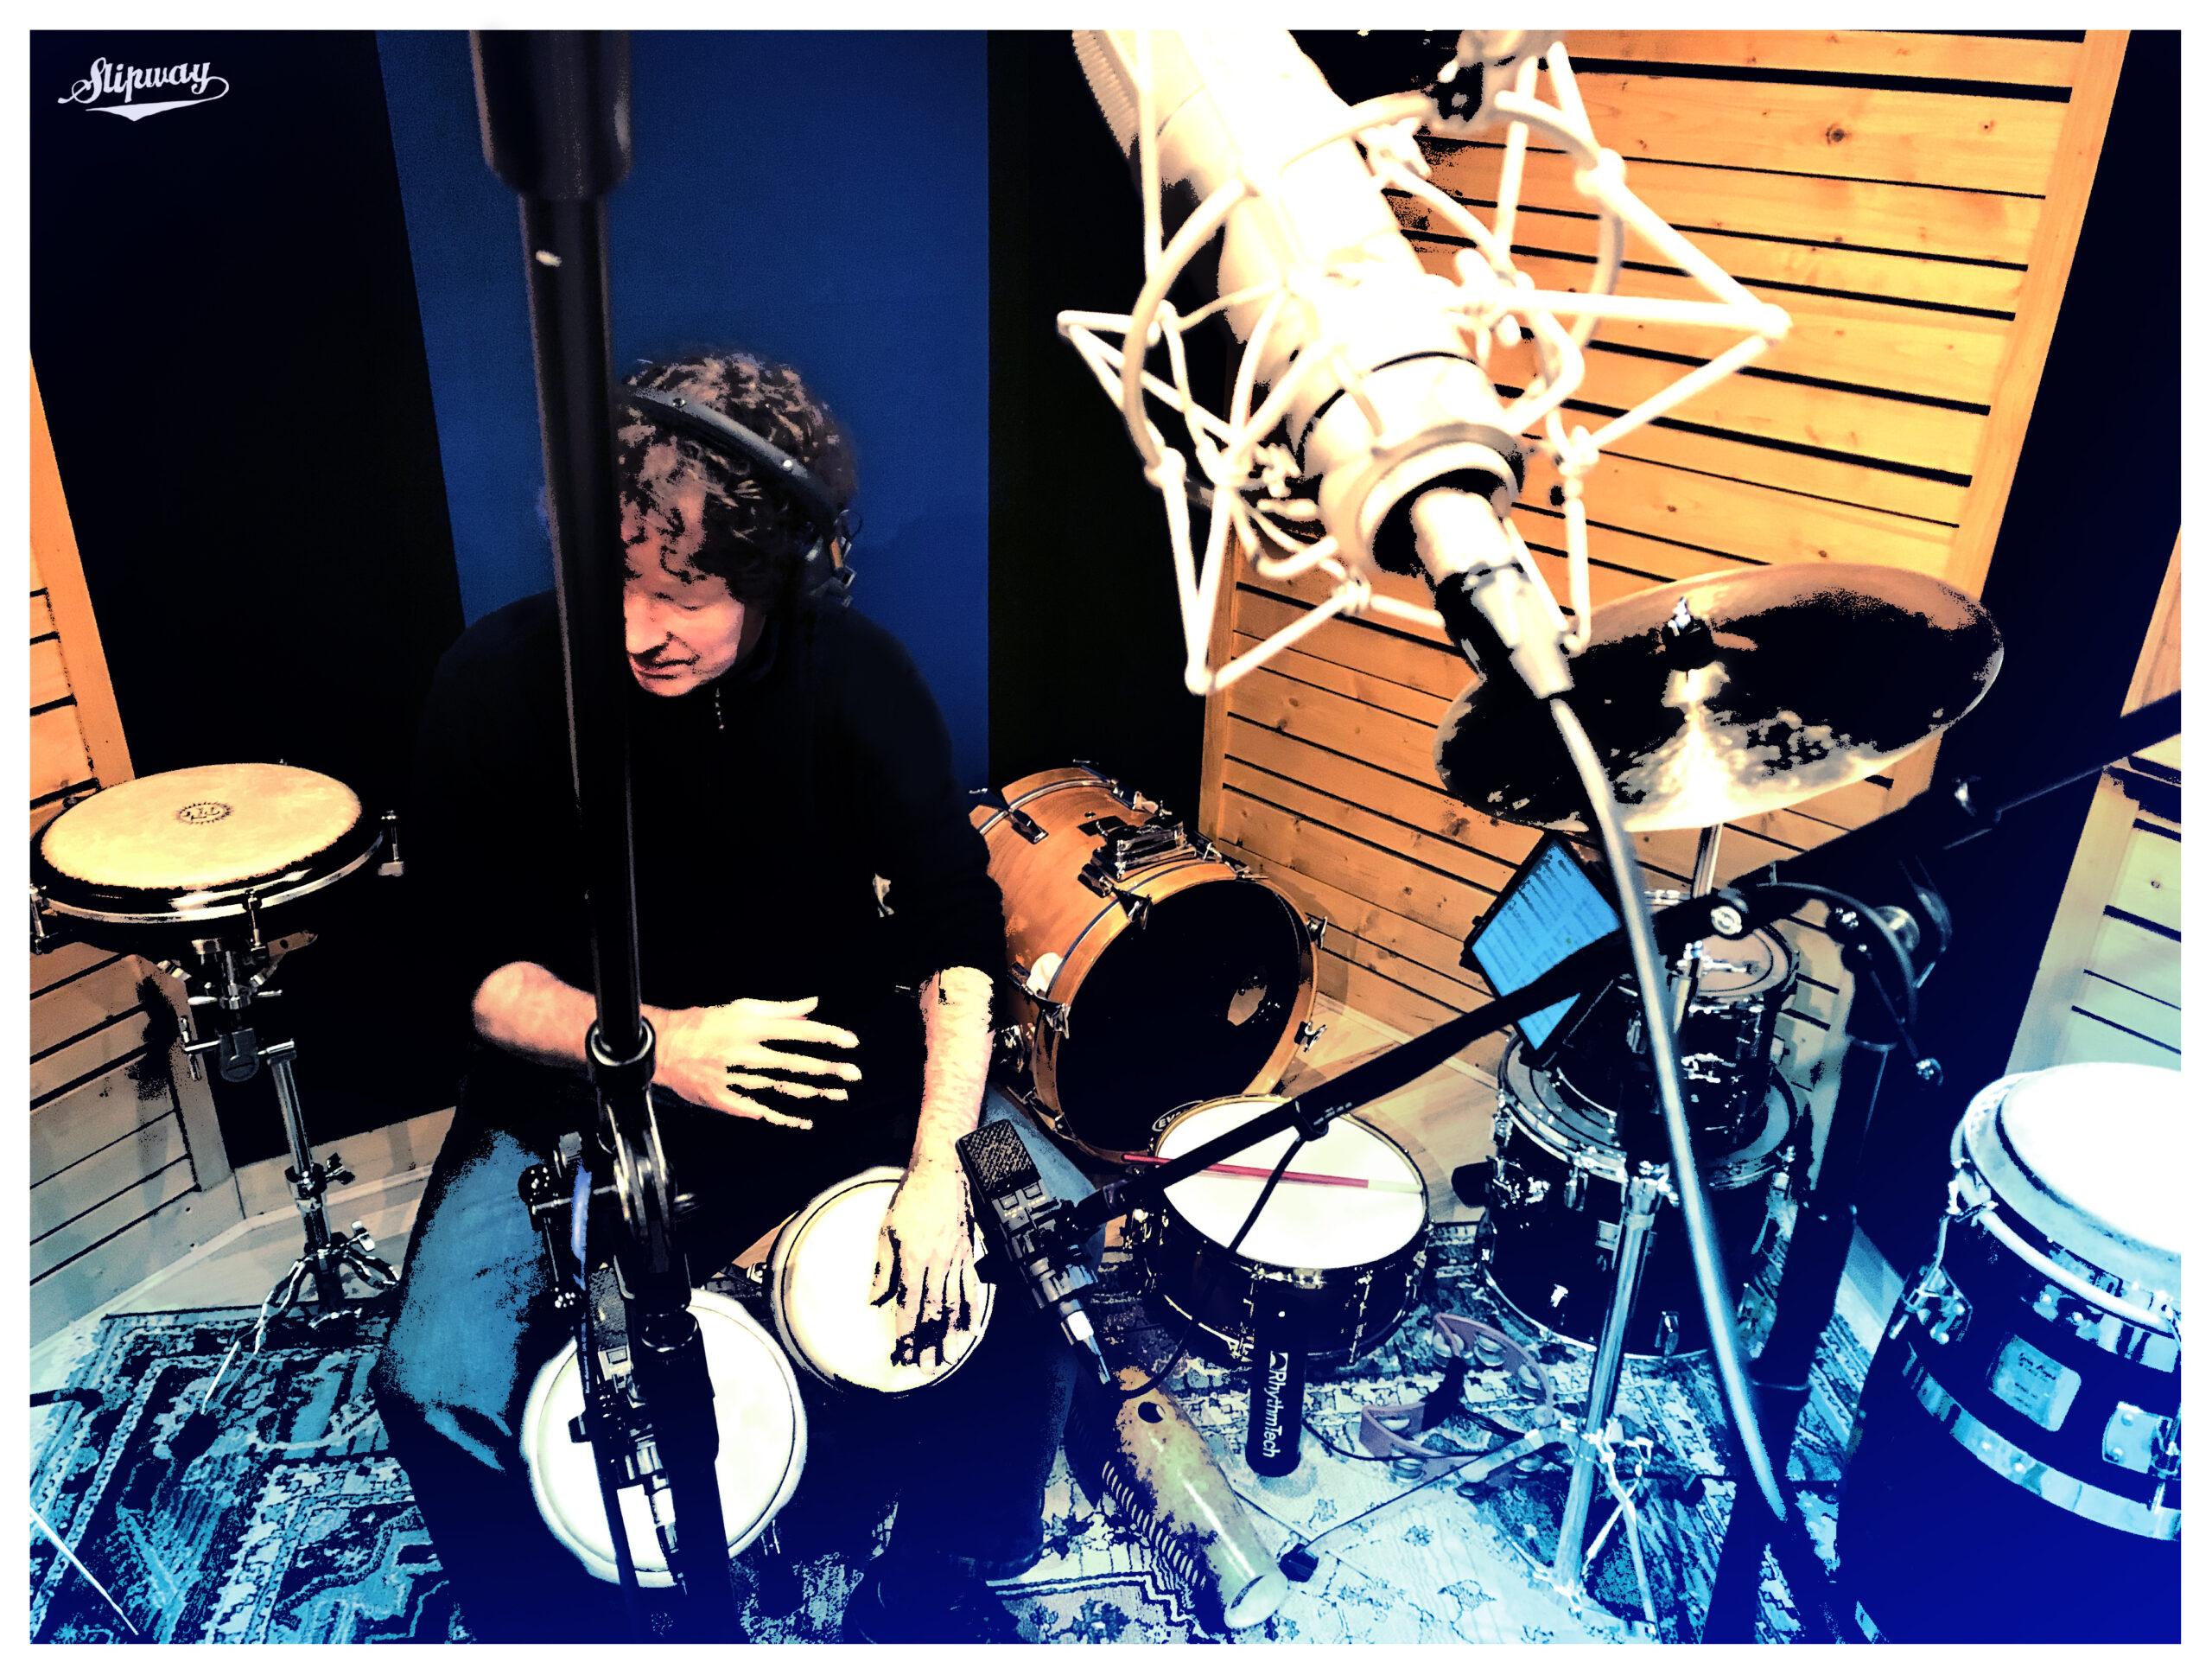 Slipway-Studio_Recording-Percussions_02